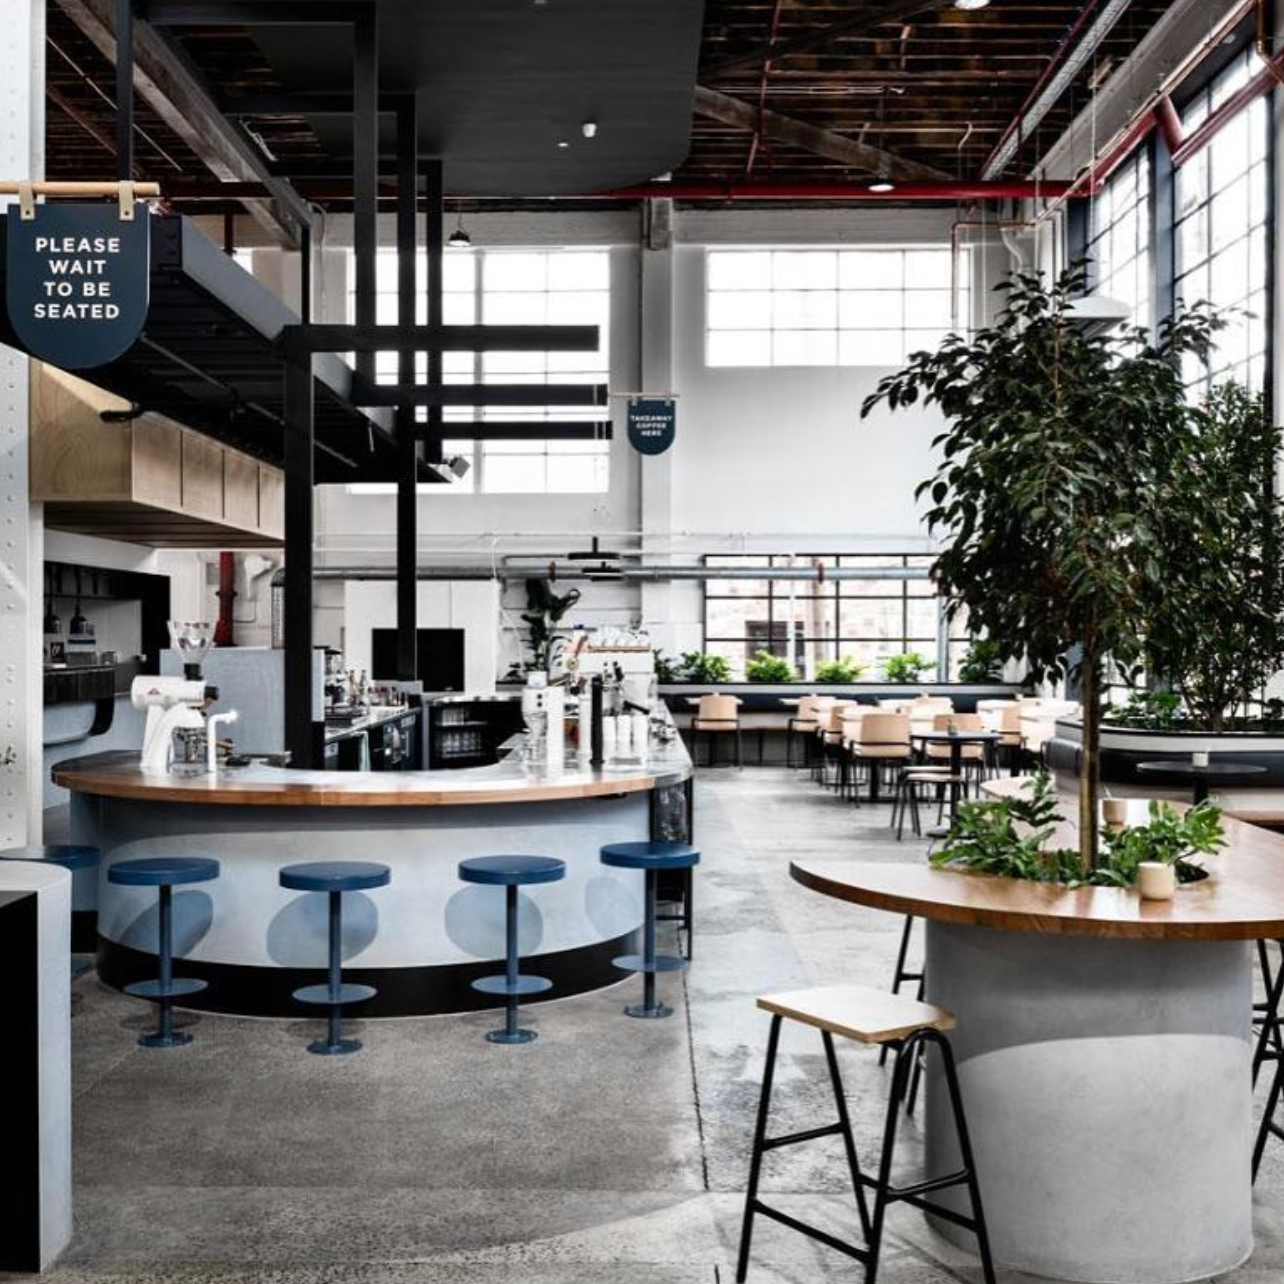 Venesiano Cafe, Richmond